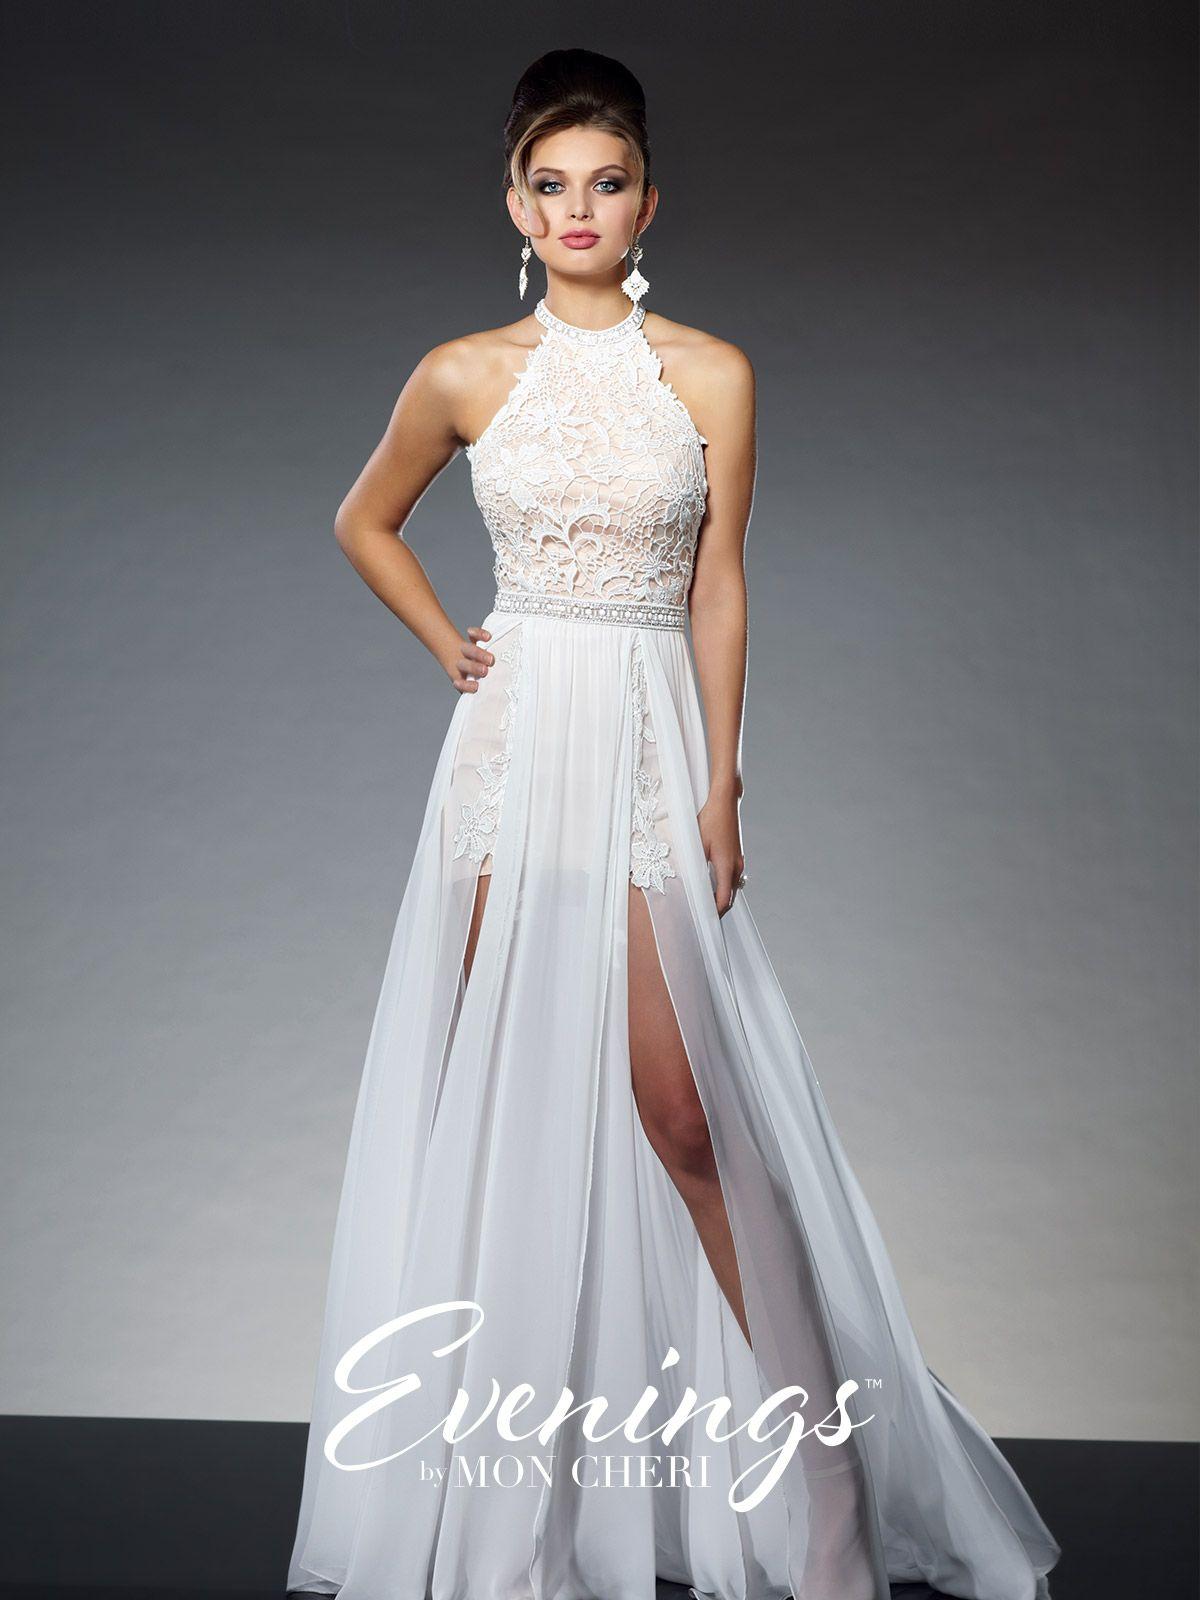 Wedding Guest Dresses 2019 Cocktail Formal Dresses White Lace Prom Dress Jersey Prom Dress Prom Dresses [ 1600 x 1200 Pixel ]